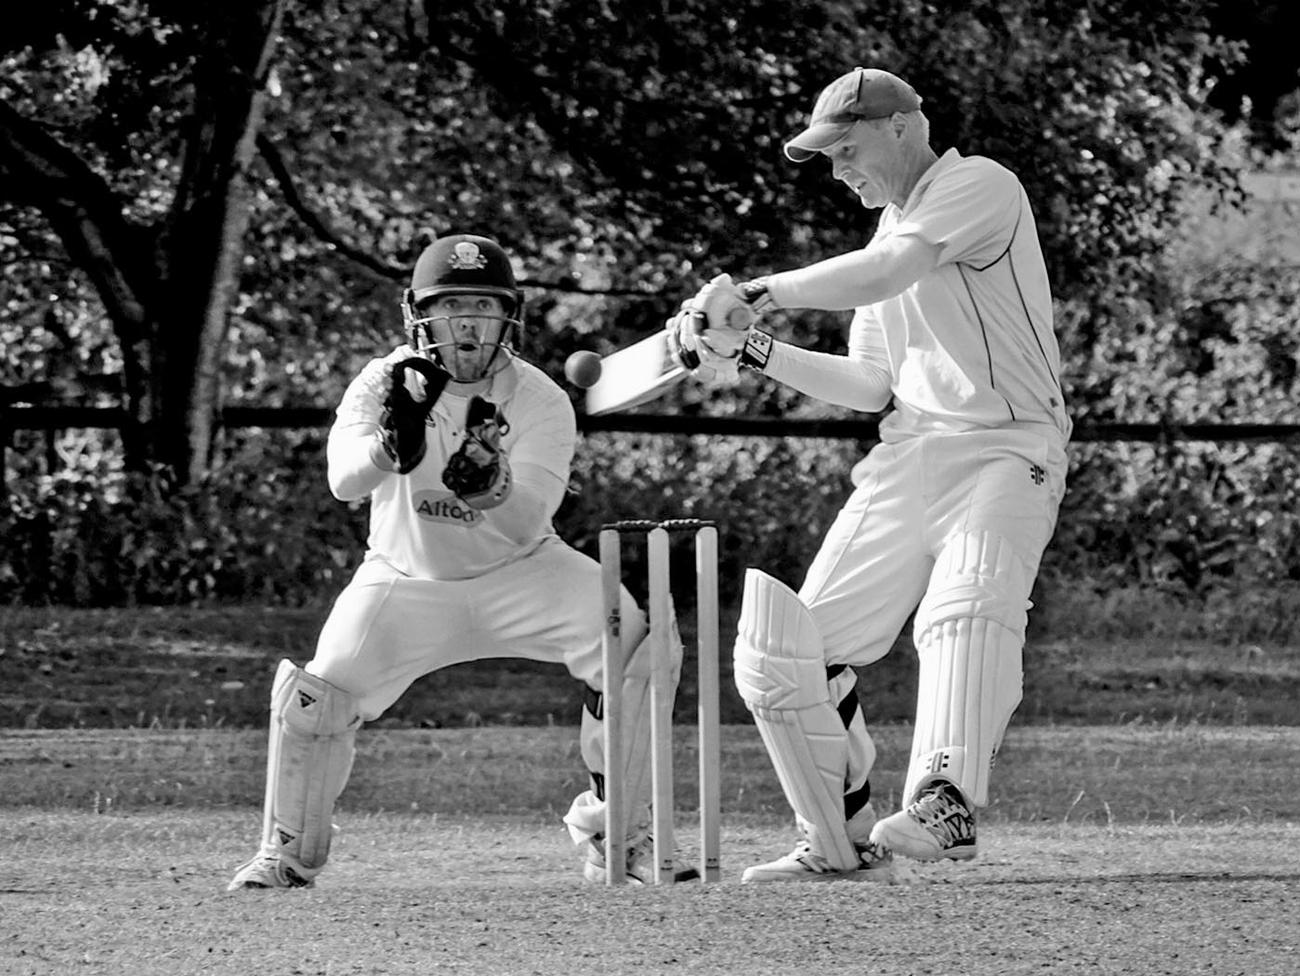 Batsman cutting a shot as wicketkeeper looks on